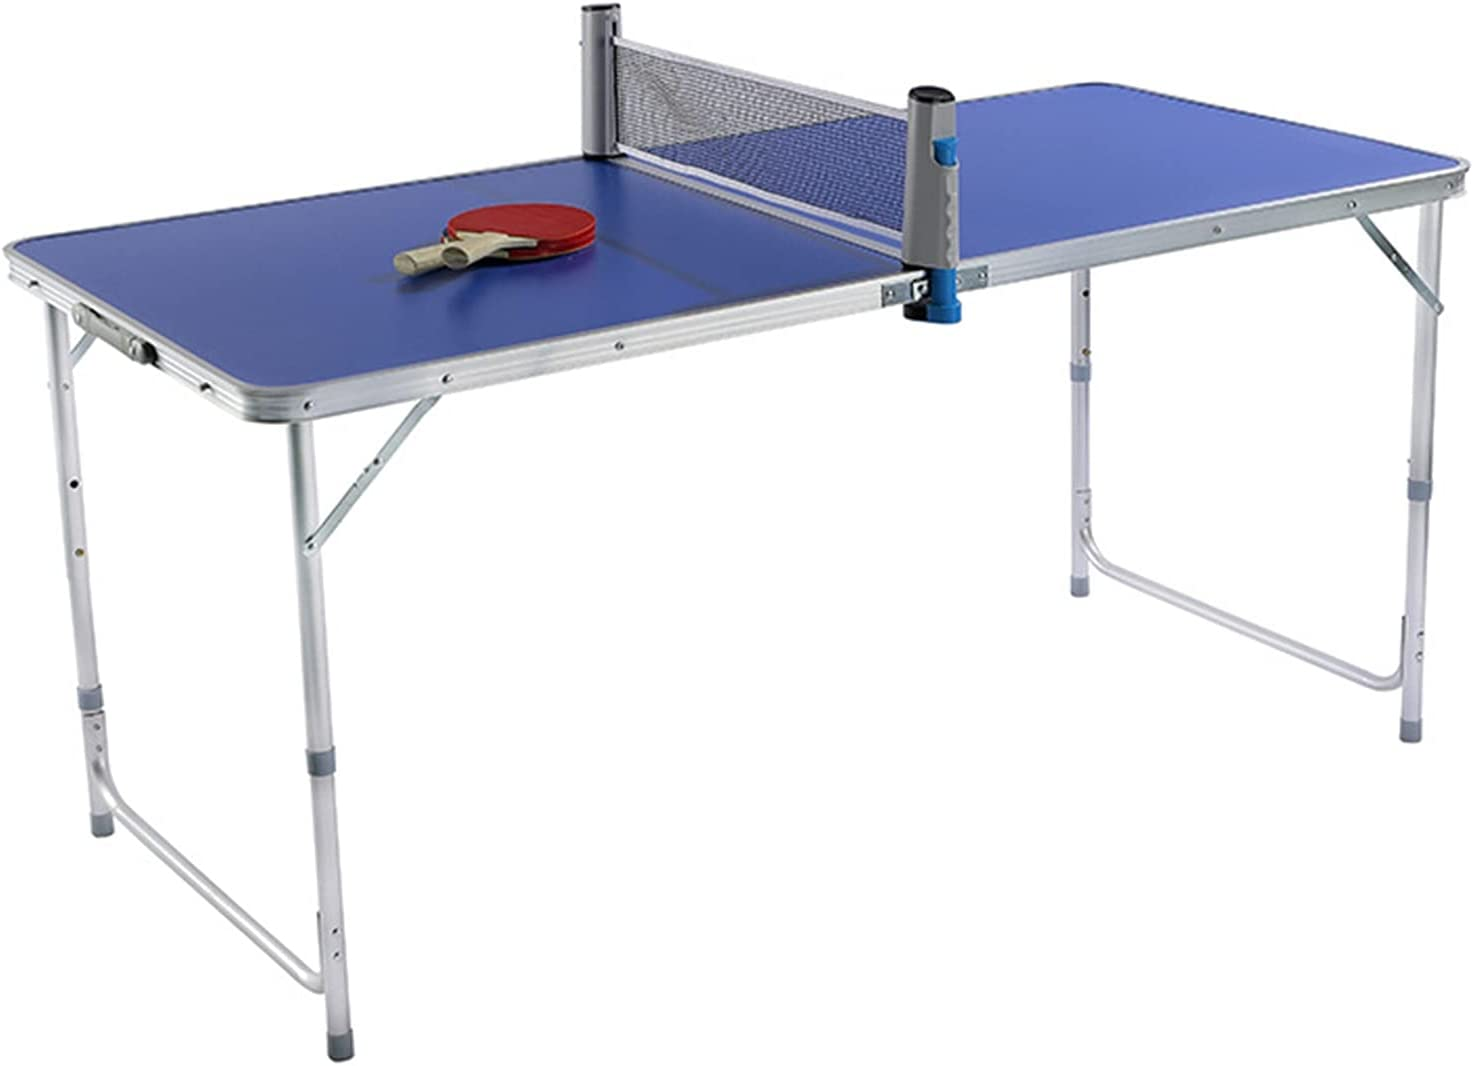 Mesa De Ping-Pong Pequeña para Niños, Mesa De Tenis De Mesa Plegable para Exteriores, Tablero De Fibra De Densidad, Fácil De Instalar, 150x70x70cm